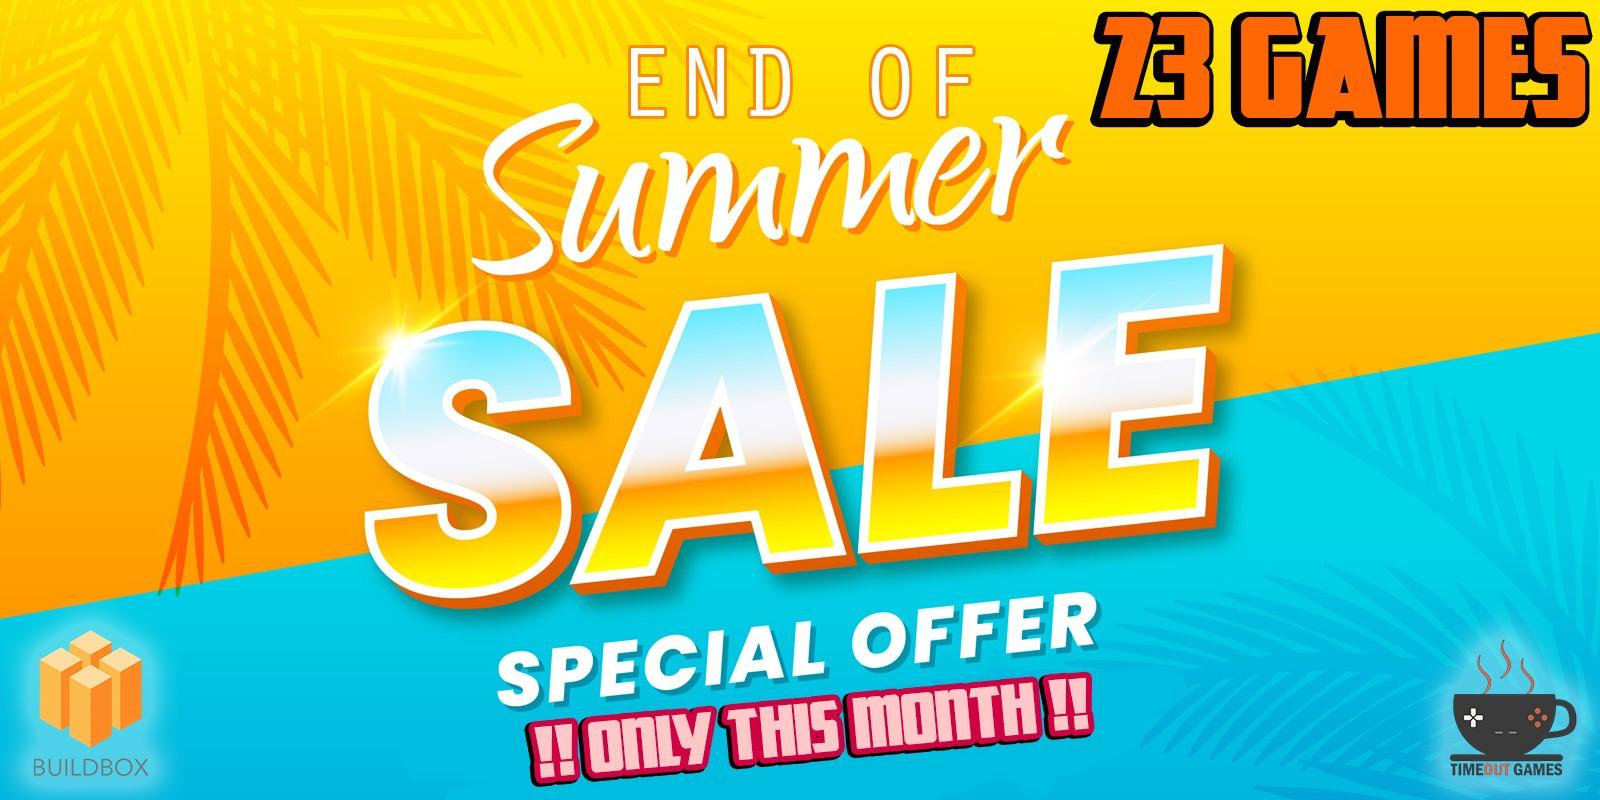 End of Summer Buildbox Sale - 23 Games